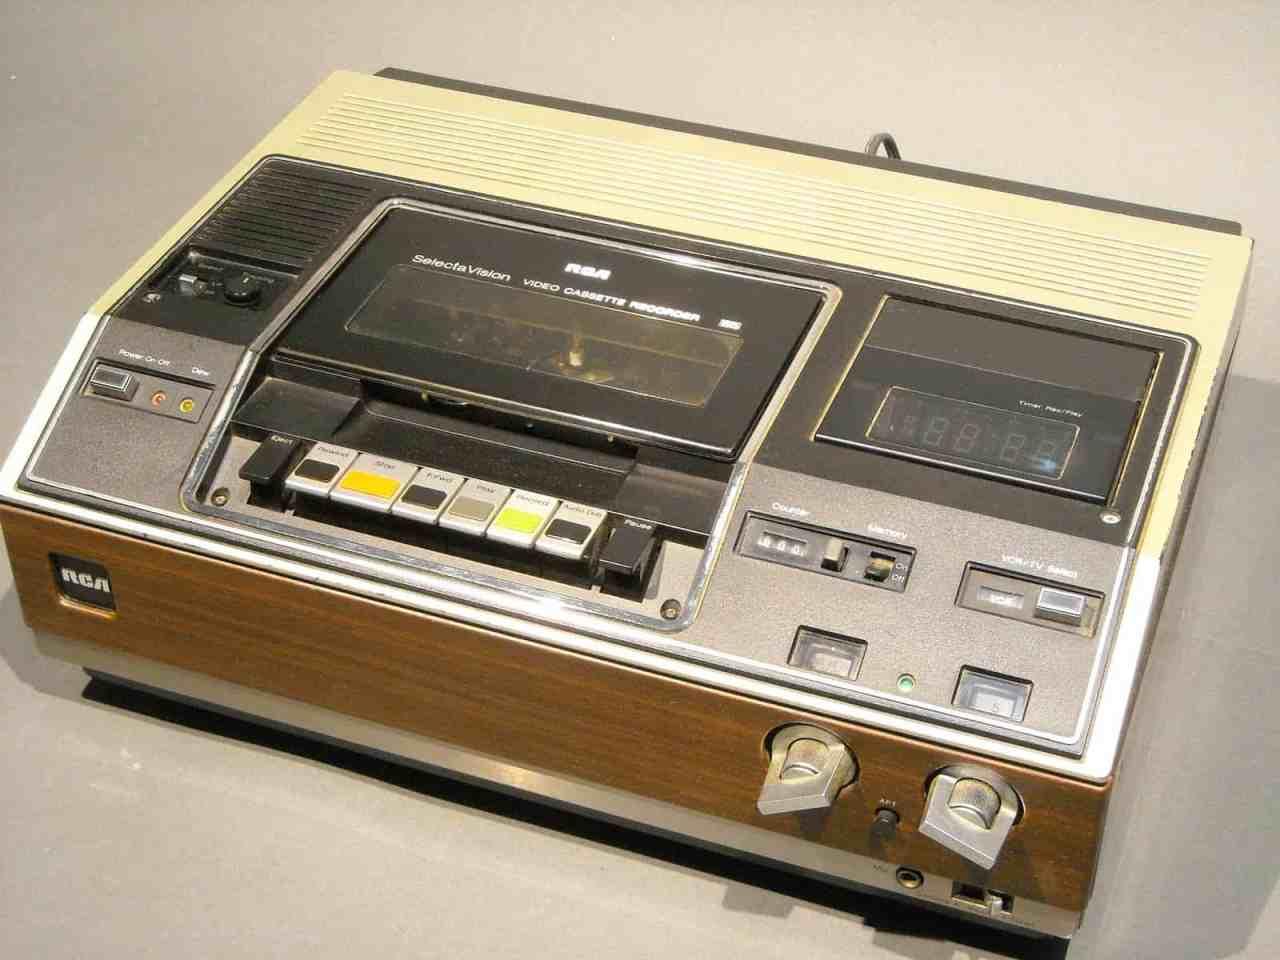 RCA VHS PLAYER VCT201 LAPAN A50 W - 8